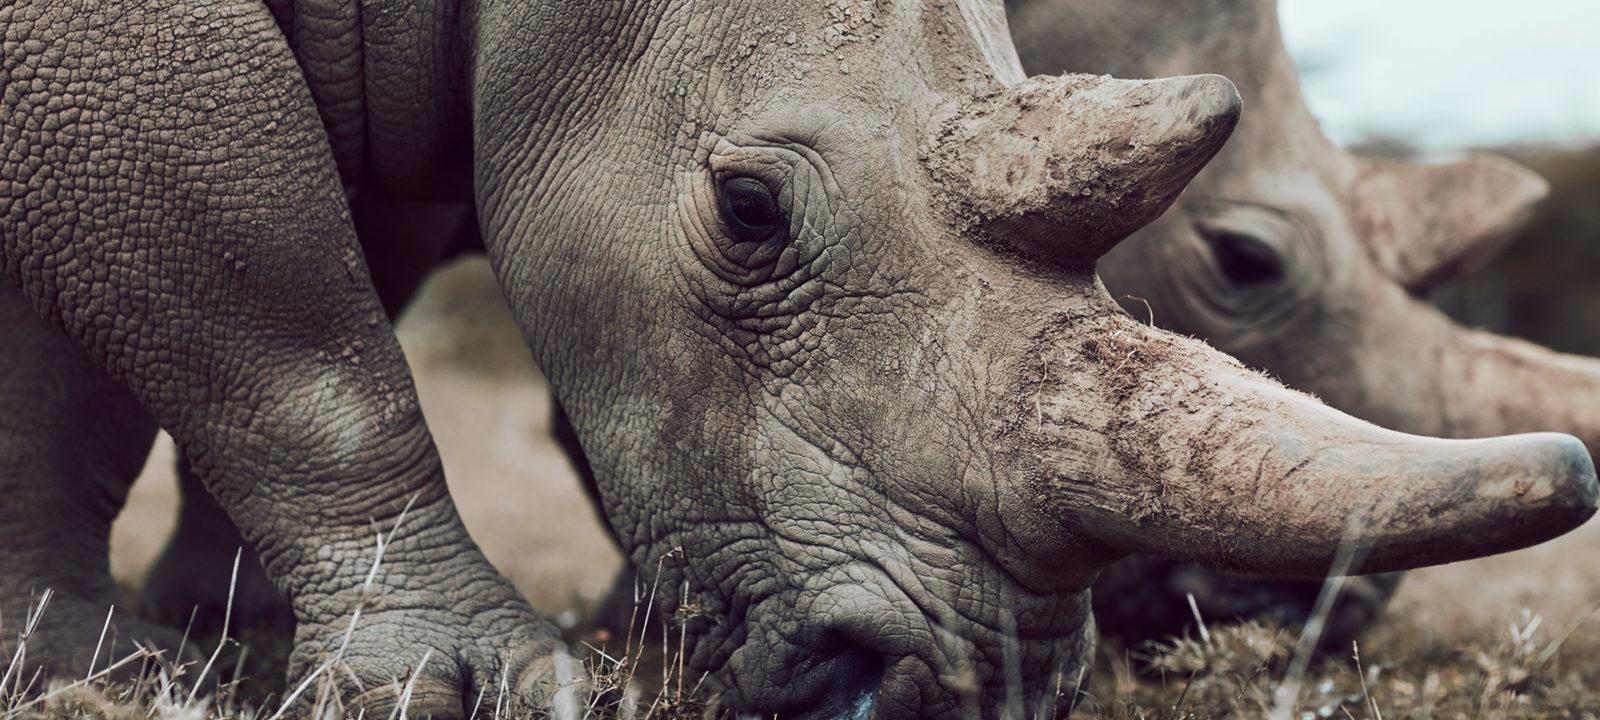 SWOP-rhinos-howtohelp